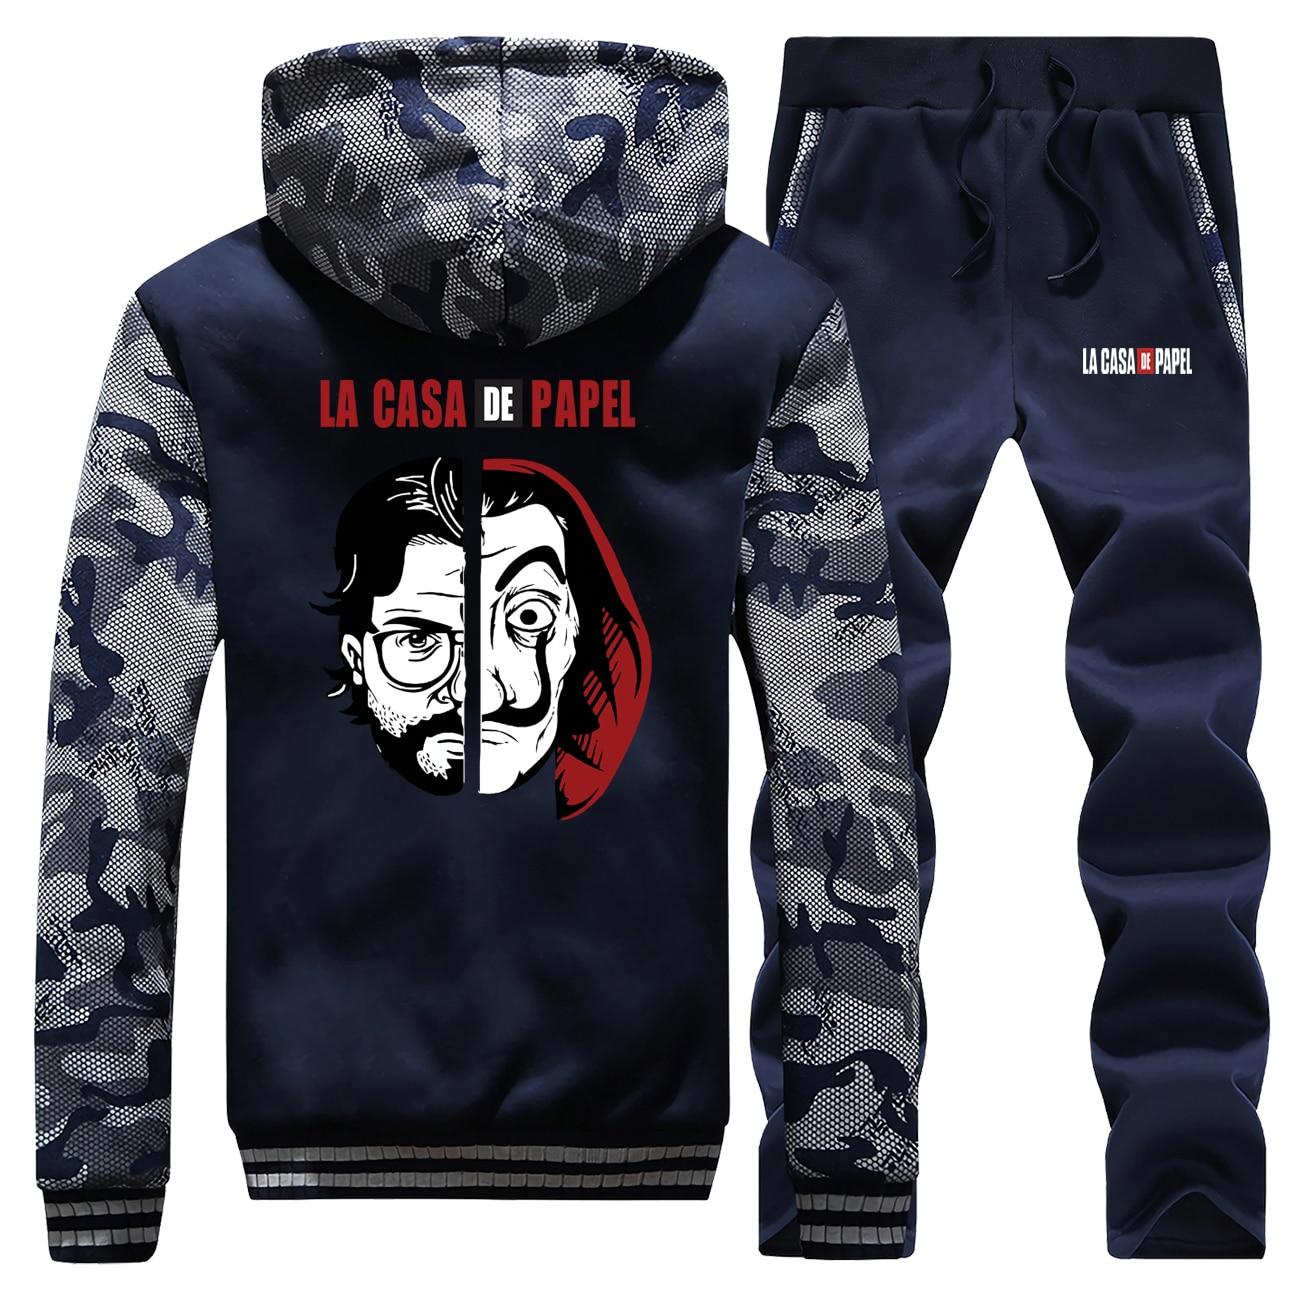 La Casa De Papel Thick Fleece Hoodies Men Hip Hop Jacket+Pants 2 Piece Sets Sergio Marquina Sweatshirt Set Mens Winter Warm Suit